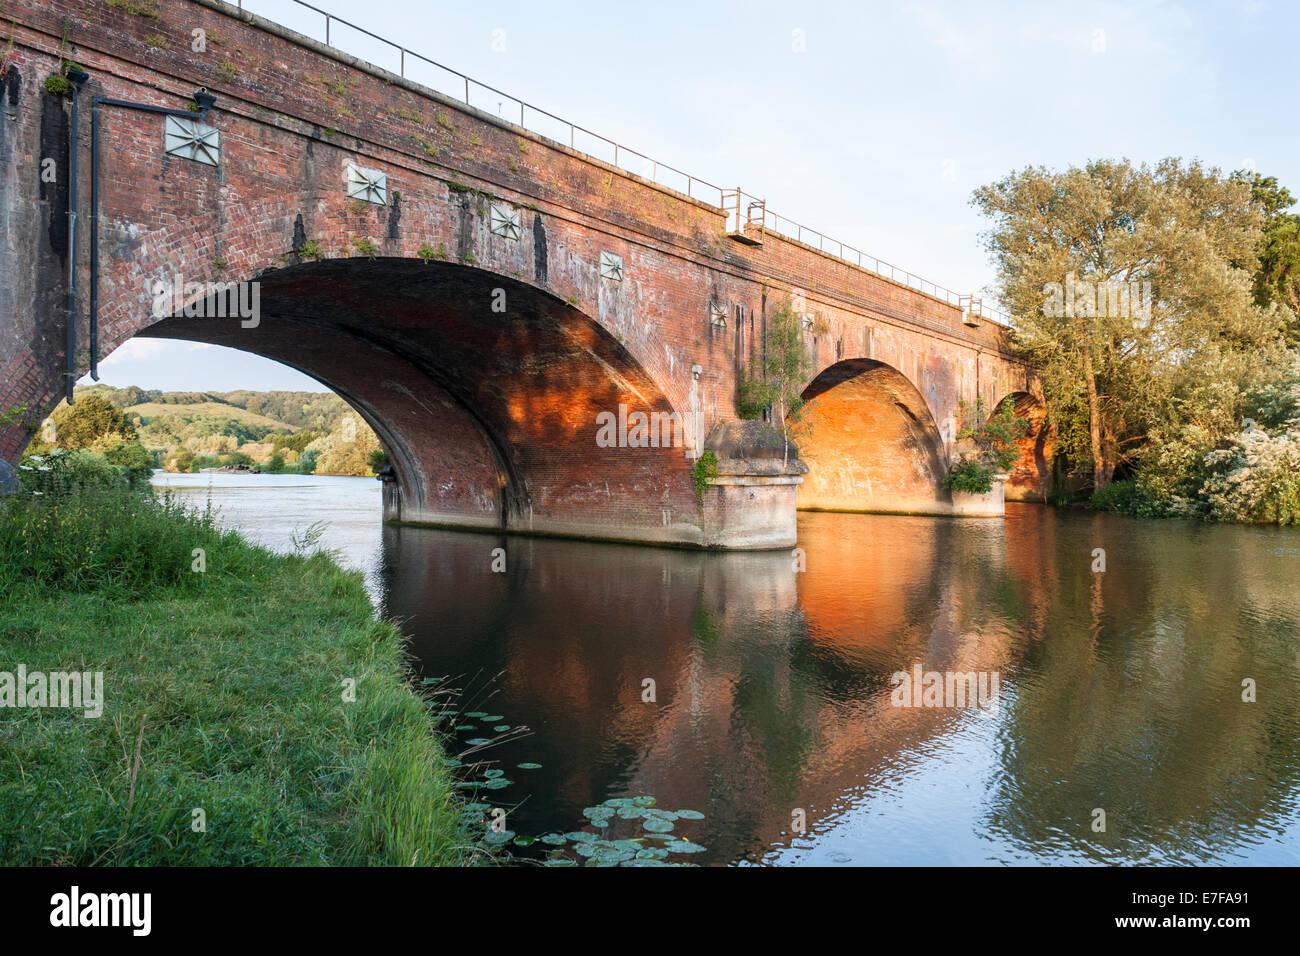 Gatehampton Railway Bridge, designed by Isambard Kingdom Brunel. Lower Basildon, Berkshire, England, GB, UK. Stock Photo